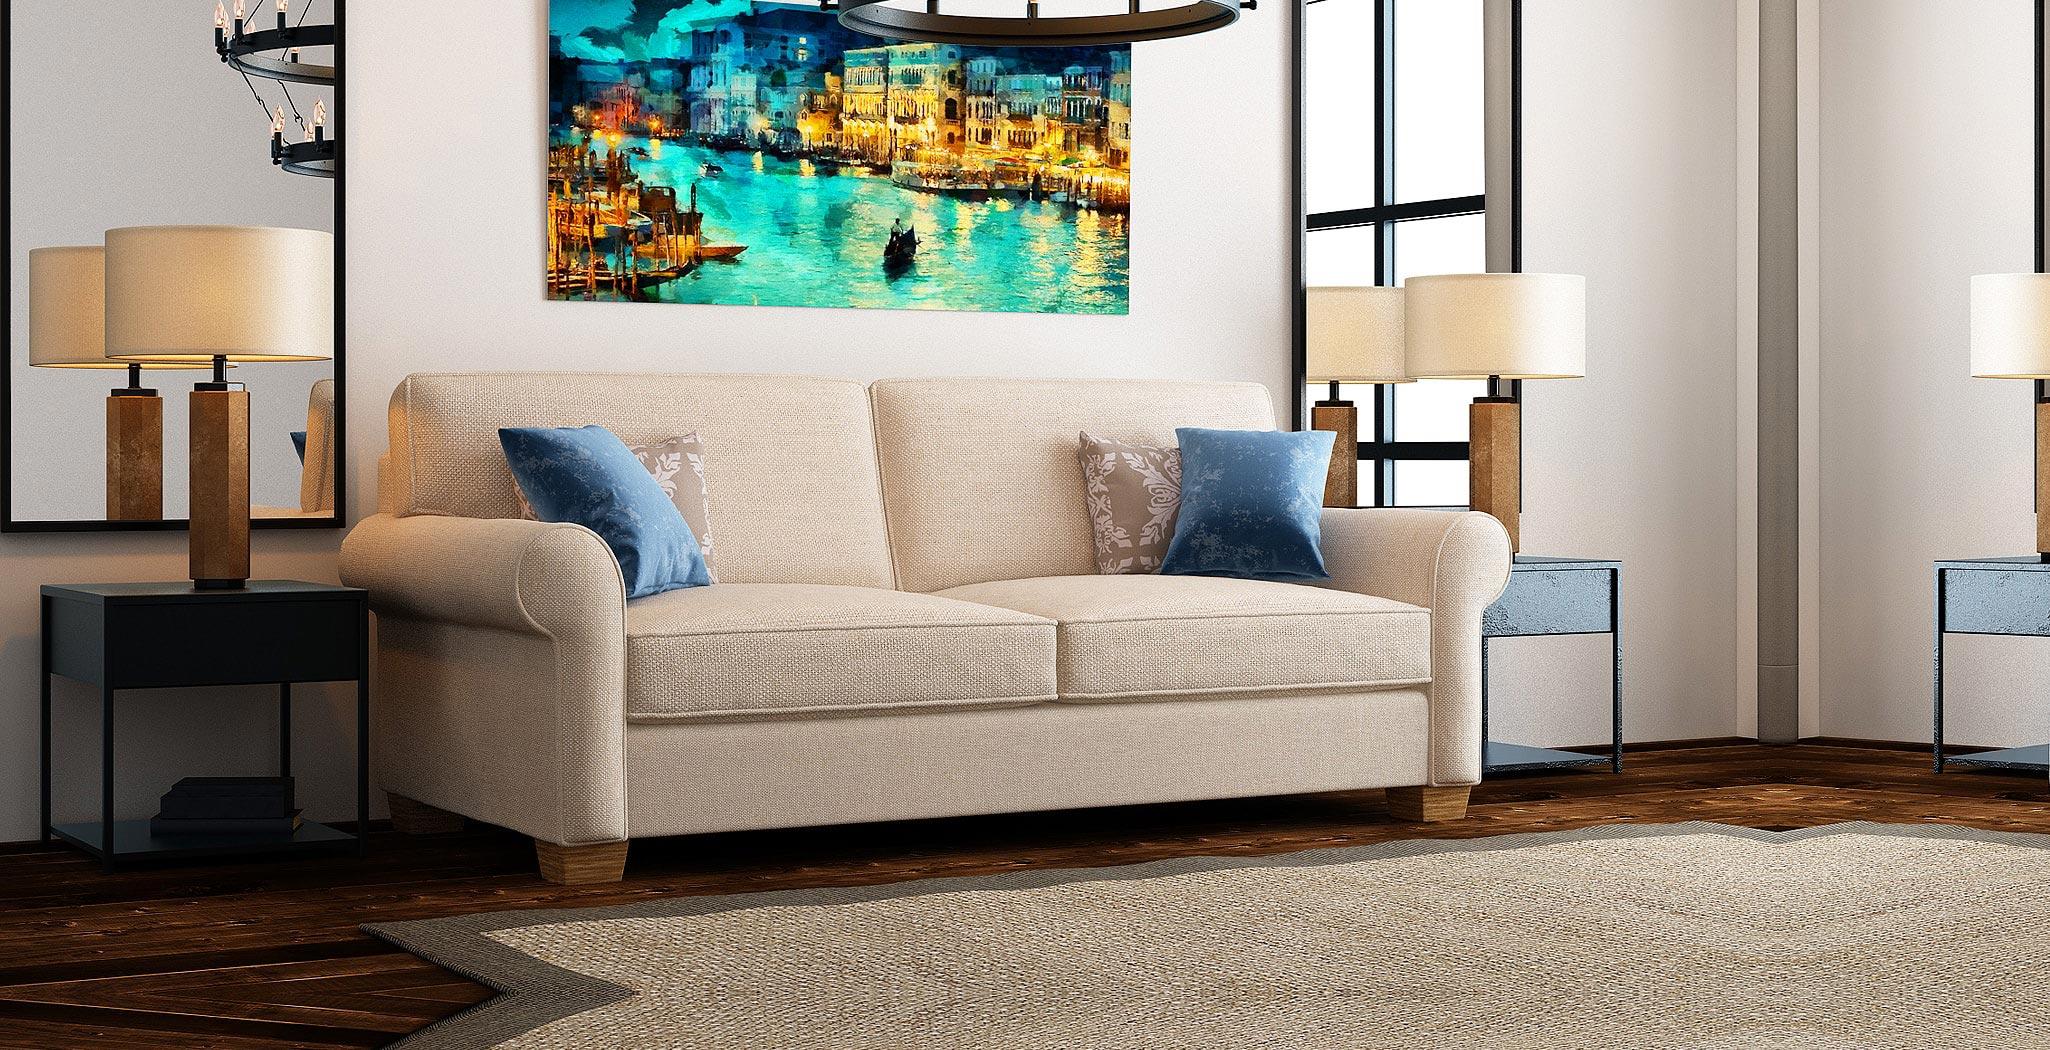 isabel sofa furniture gallery 1